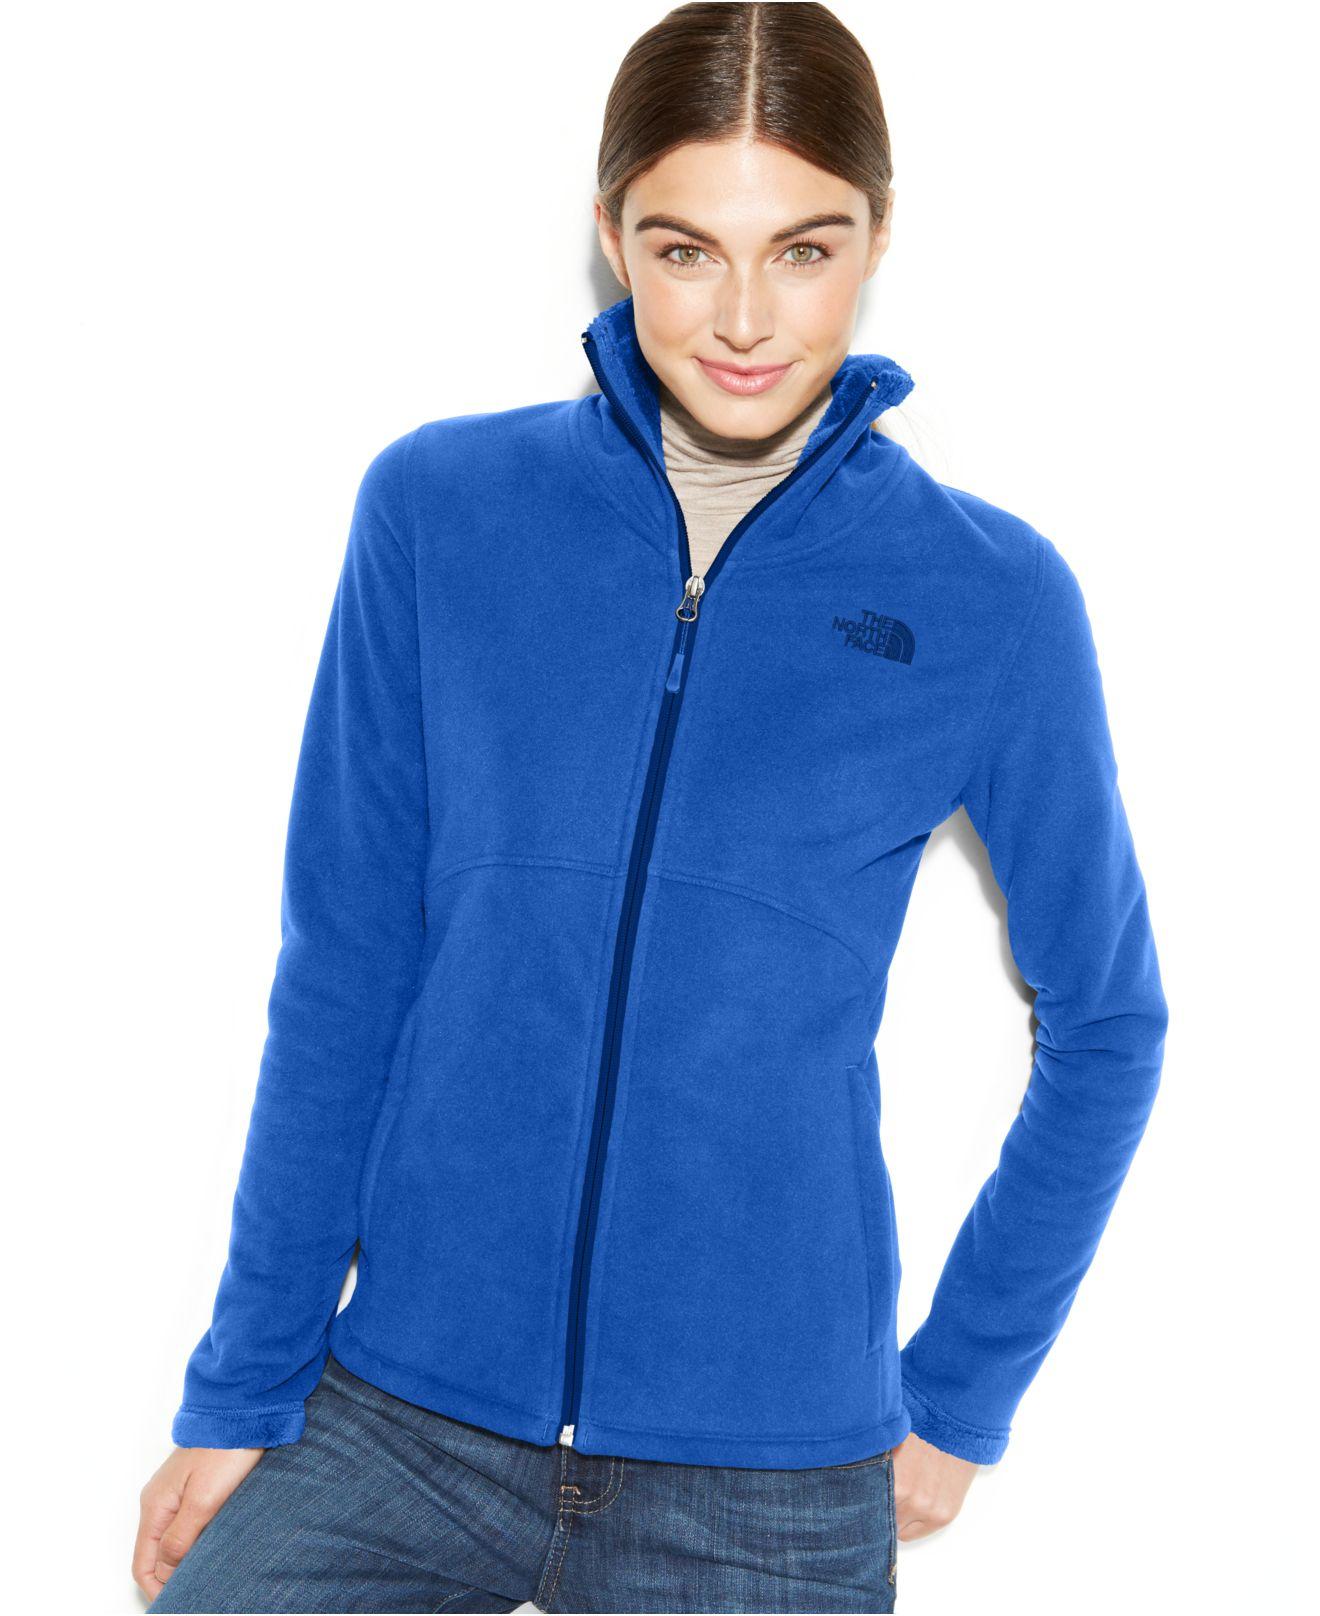 0ecd436ce8fc authentic north face zip up fleece jacket 934aa 0b09a